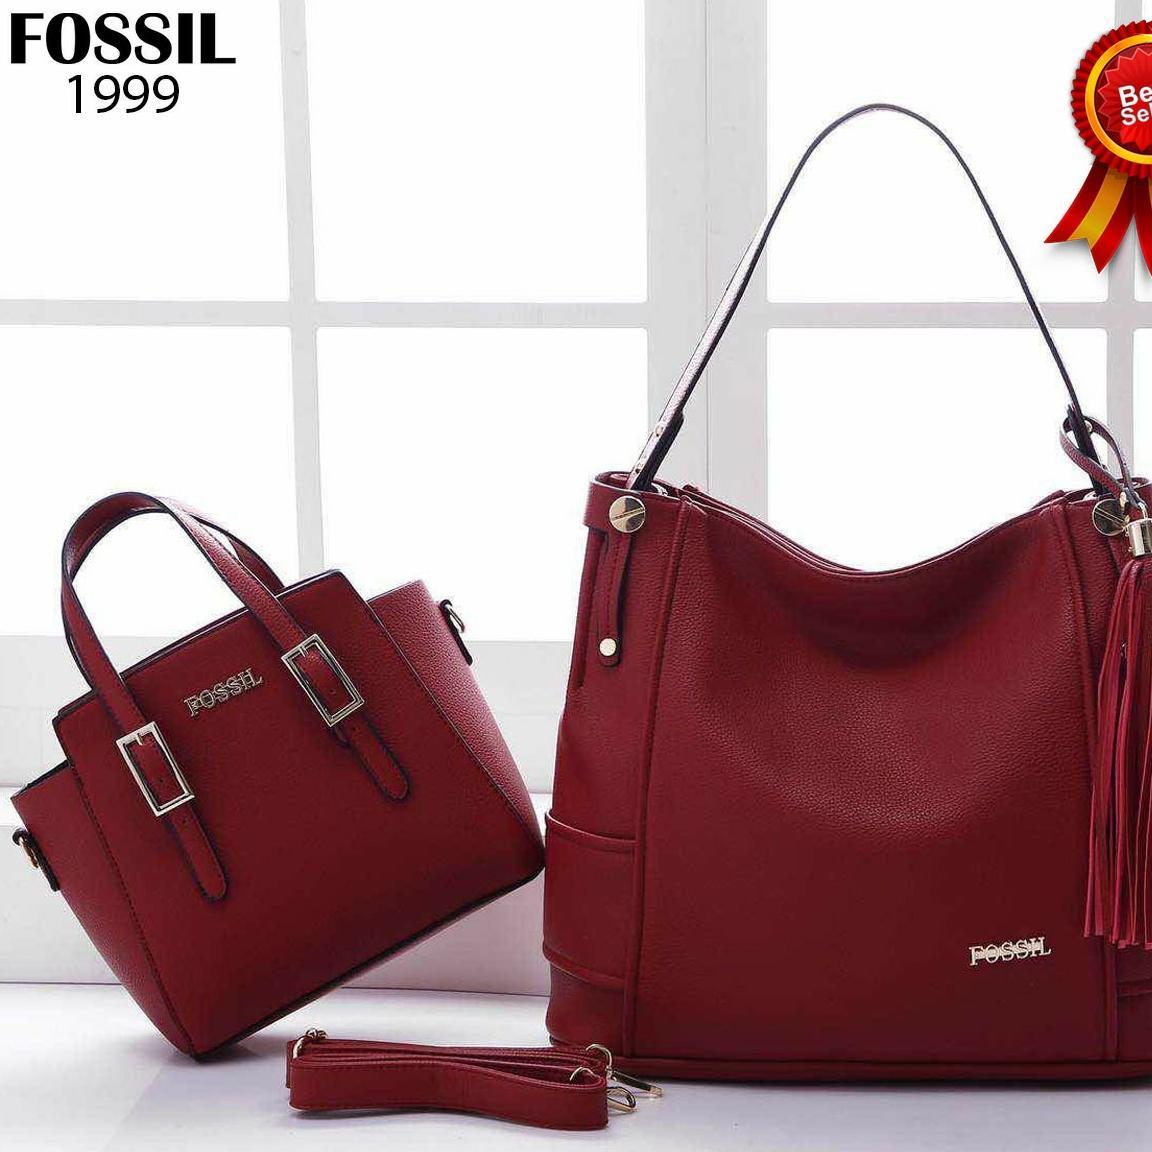 tas wanita fossil hobo mewah branded import elegan tas kerja cewek santai  shopping best sellee batam 6c358e0acf